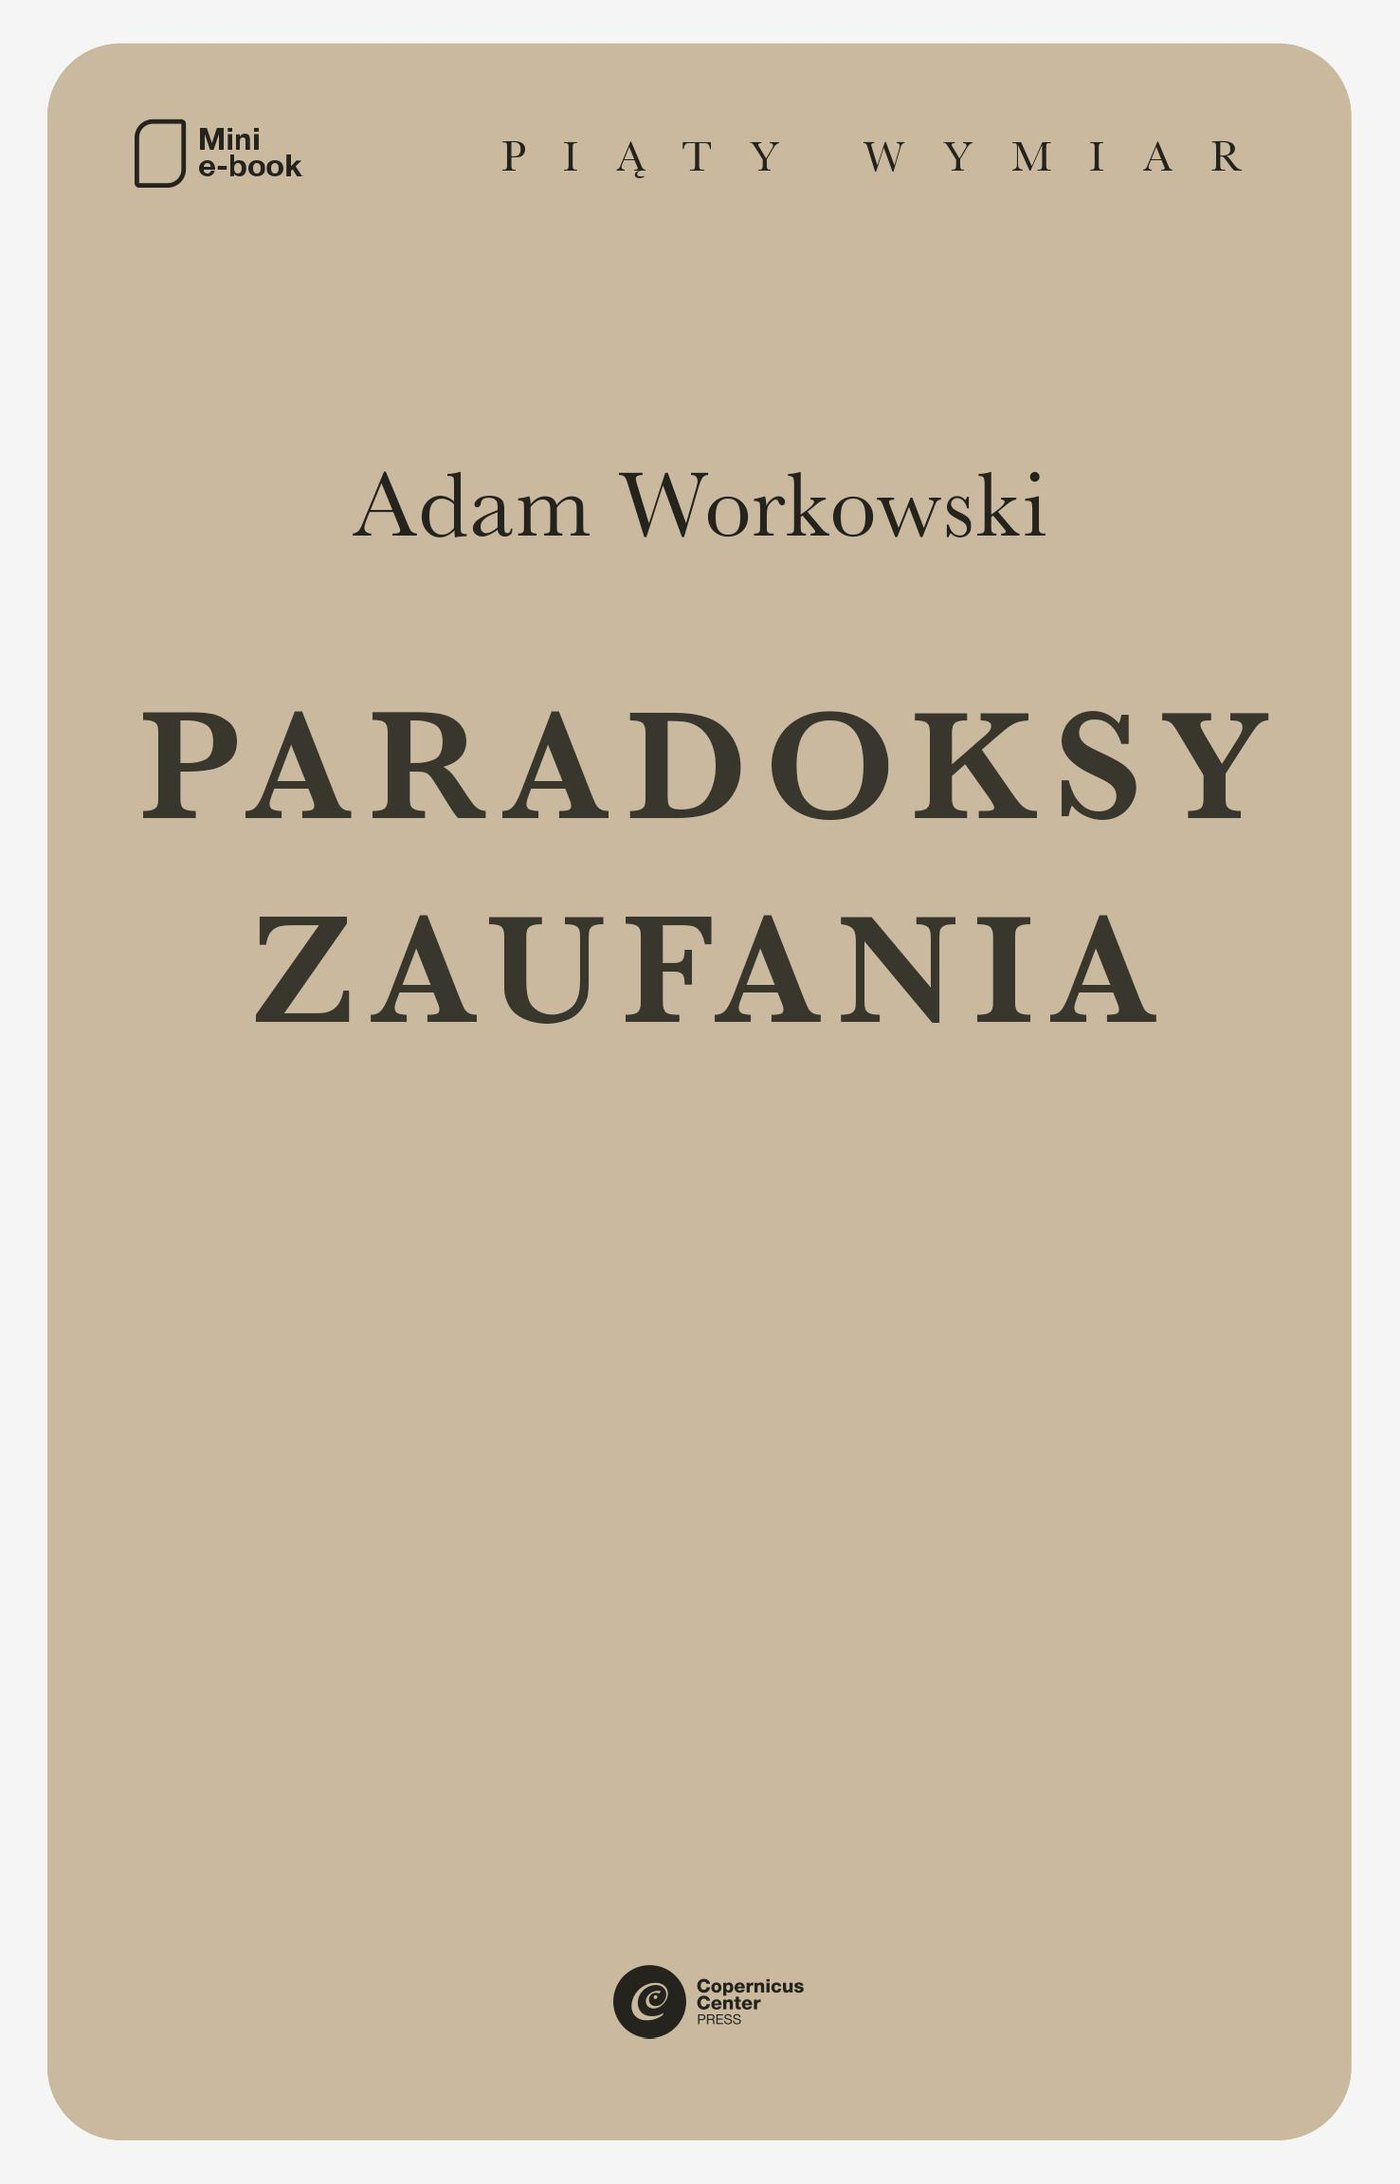 Paradoksy zaufania - Ebook (Książka na Kindle) do pobrania w formacie MOBI